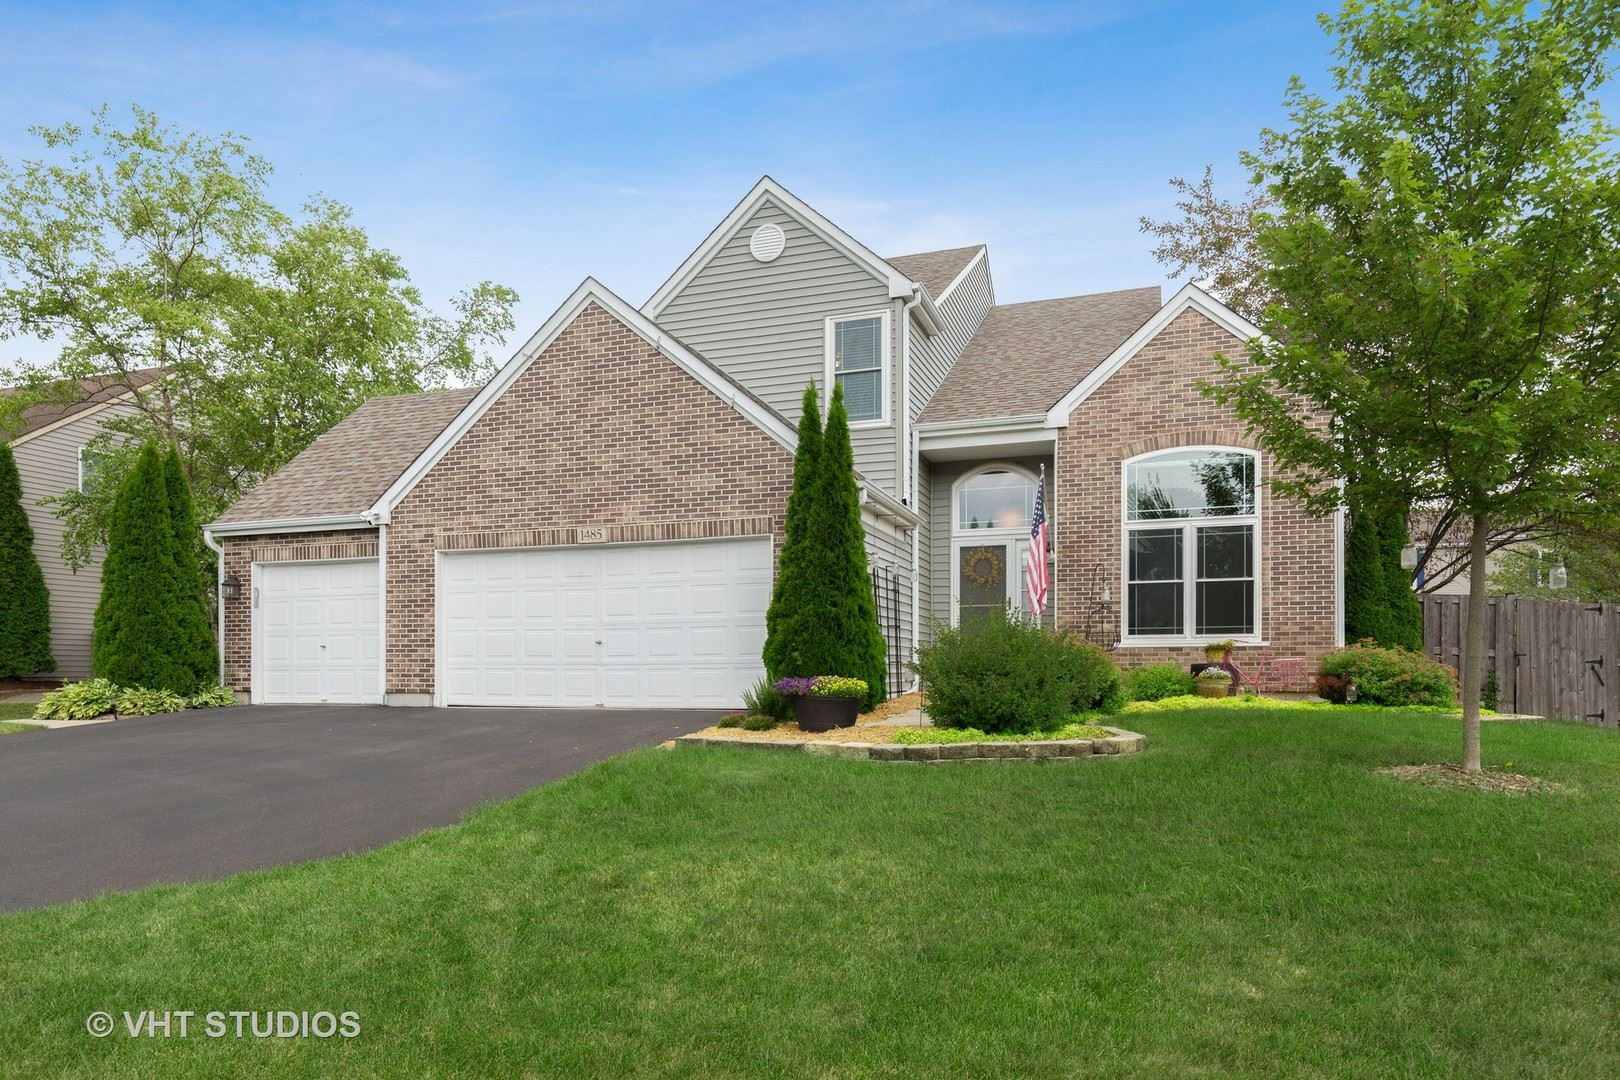 1485 Woodscreek Circle, Crystal Lake, IL 60014 - #: 10766275